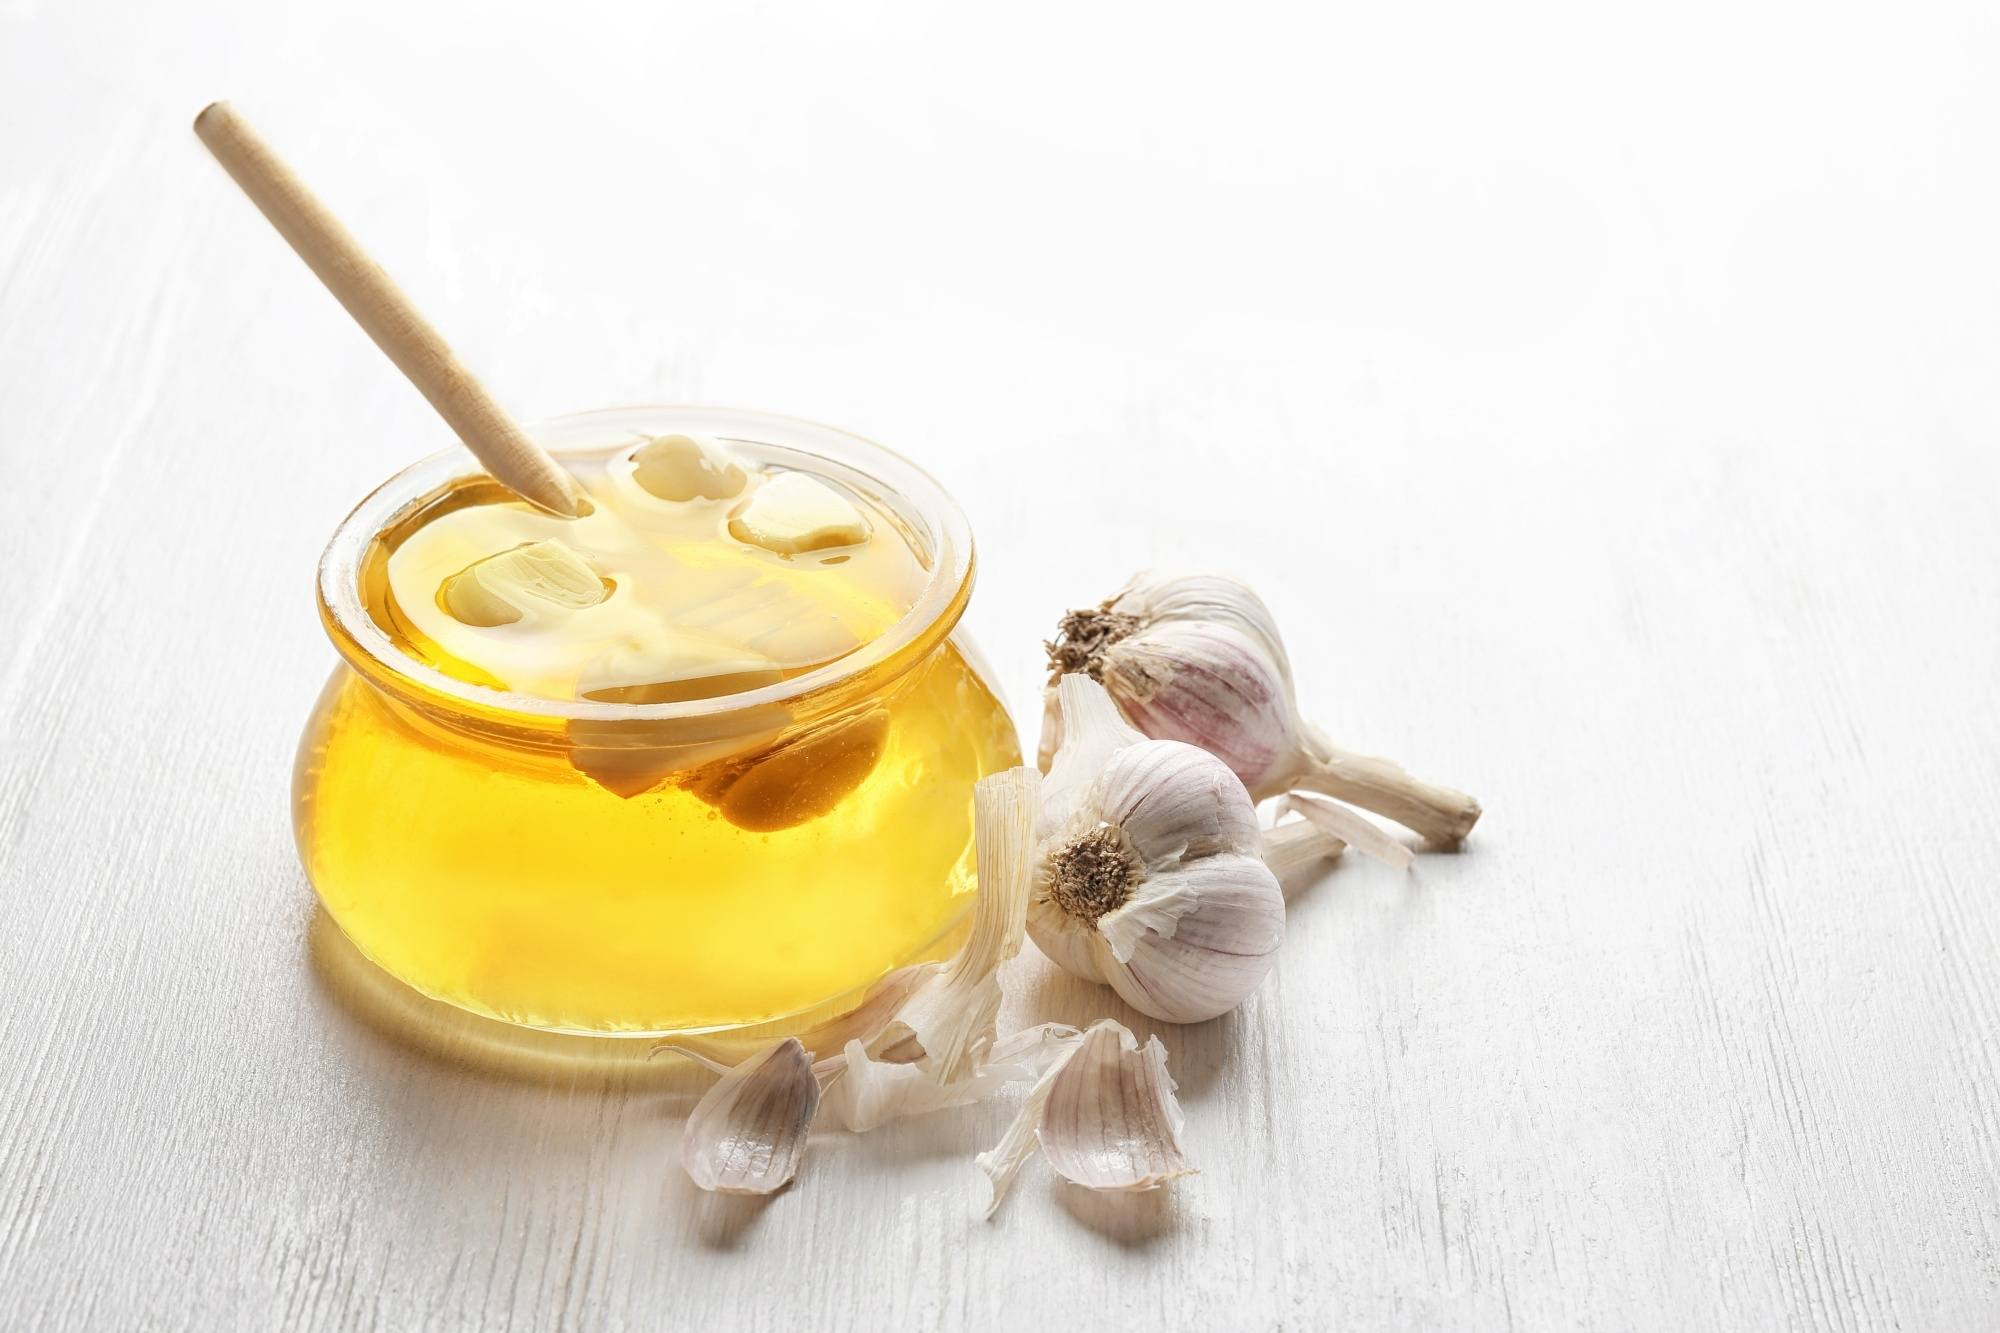 Natural dandruff remedies: garlic with a jar of honey